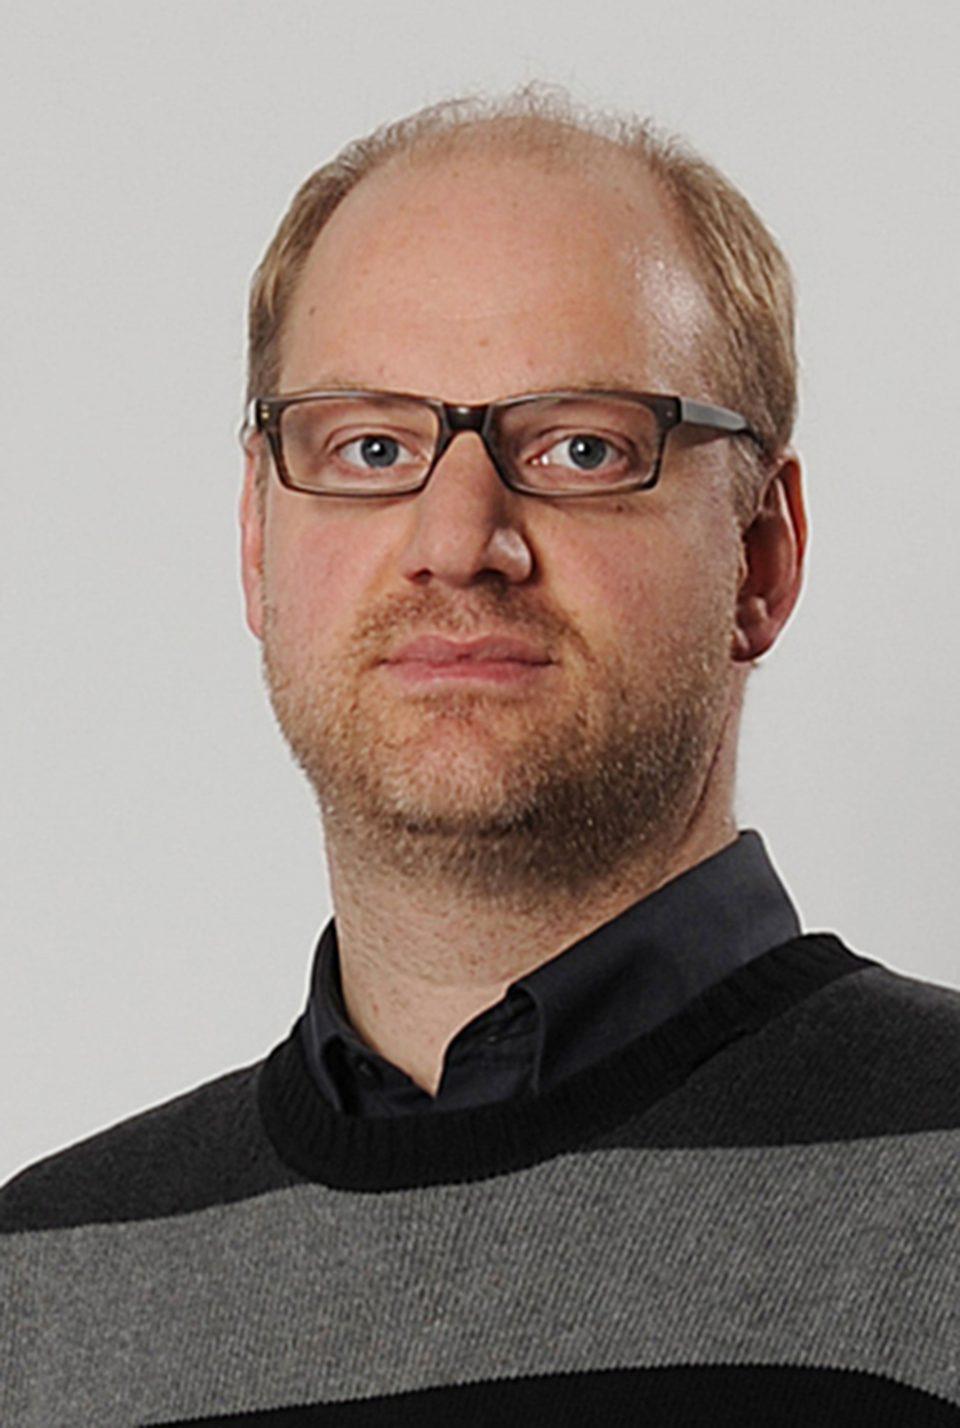 Thorsten Coers, Opernchorsänger am Staatstheater Cottbus